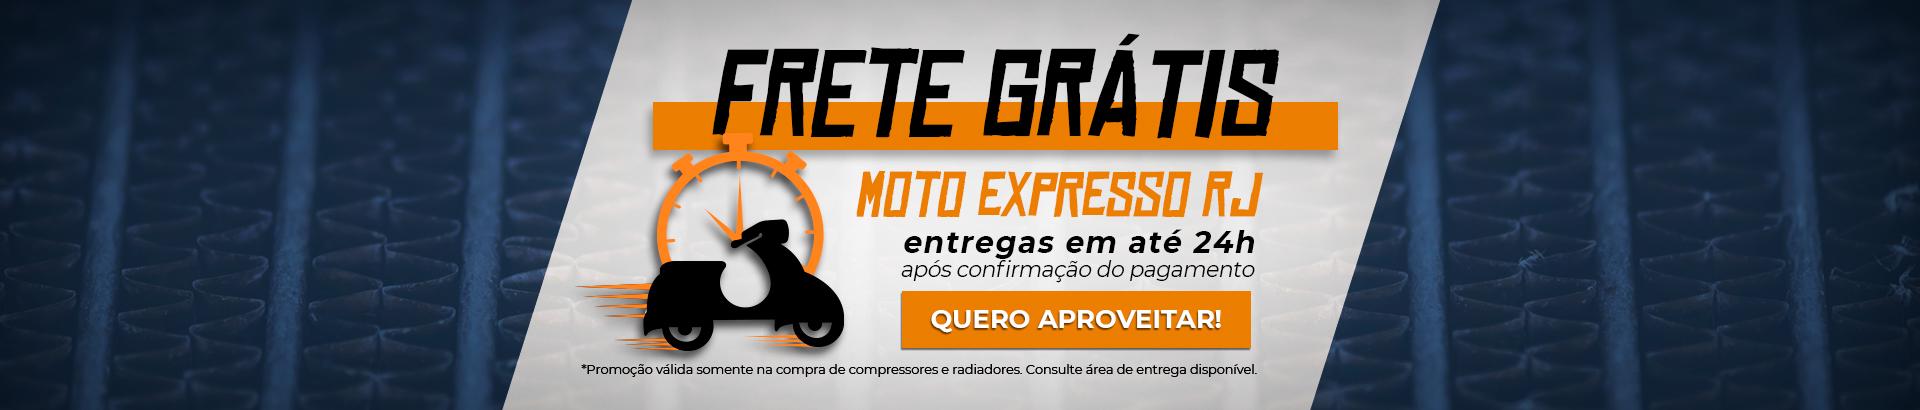 FRETE MOTO EXPRESSO RJ